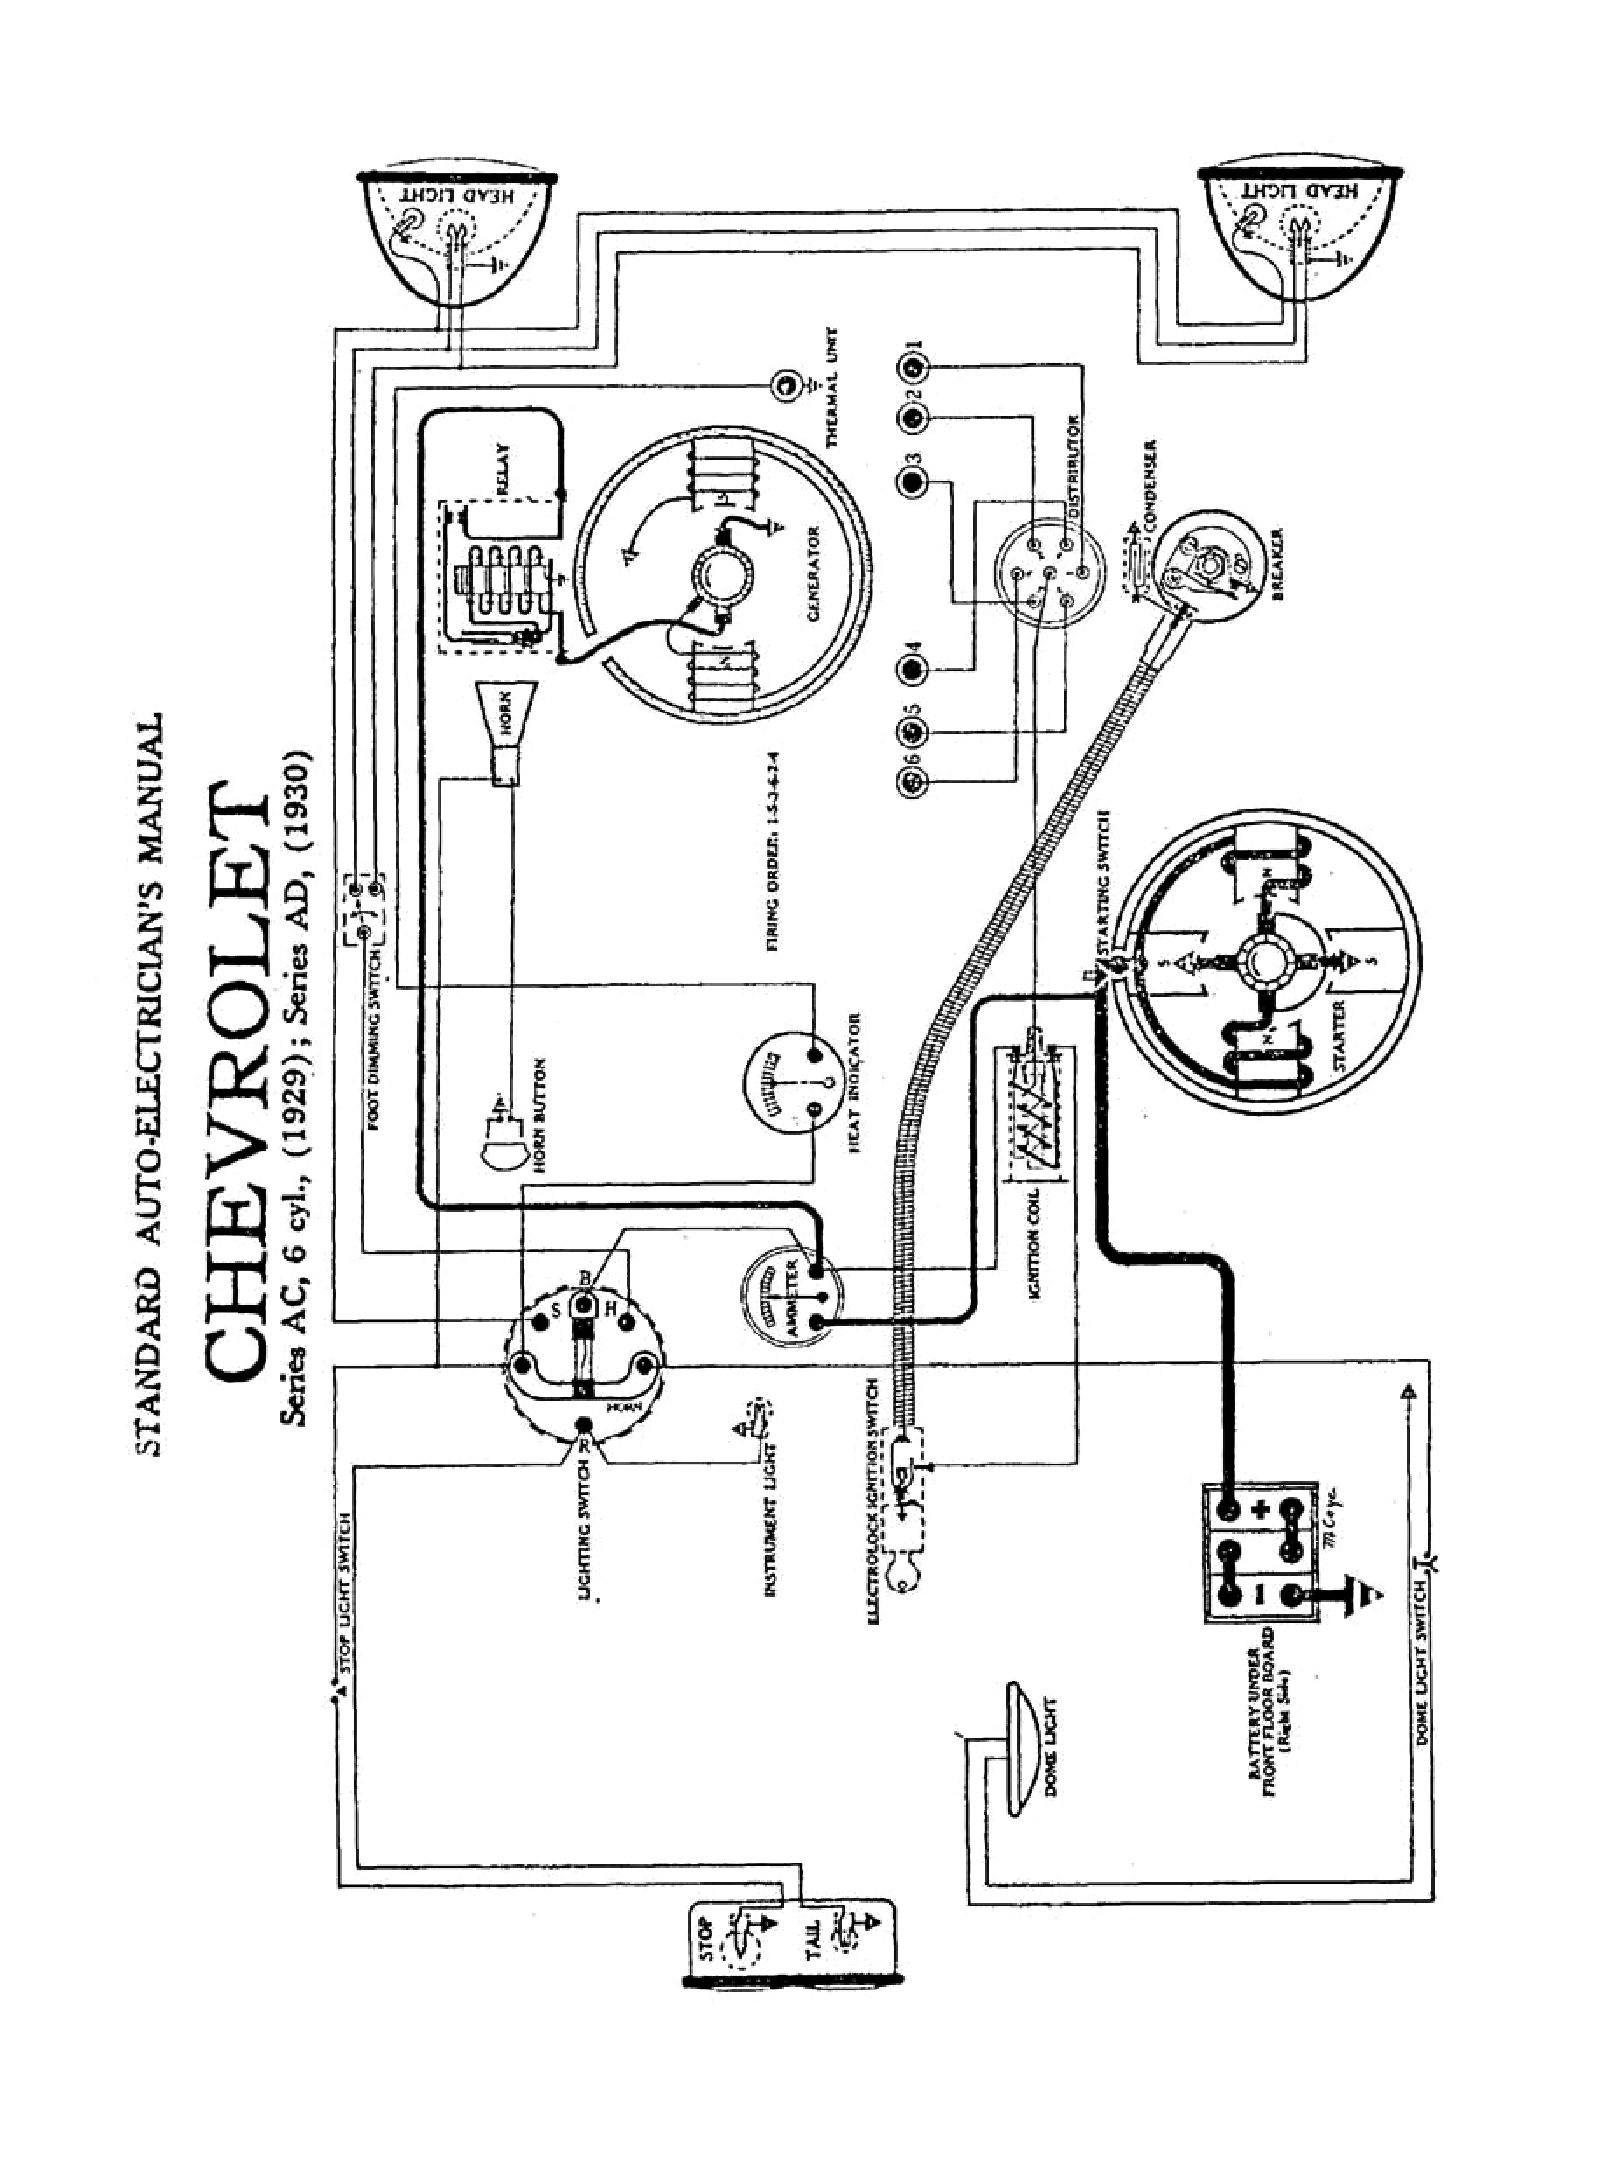 Points Distributor Wiring Diagram General Motors   Wiring Diagram - General Motors Wiring Diagram